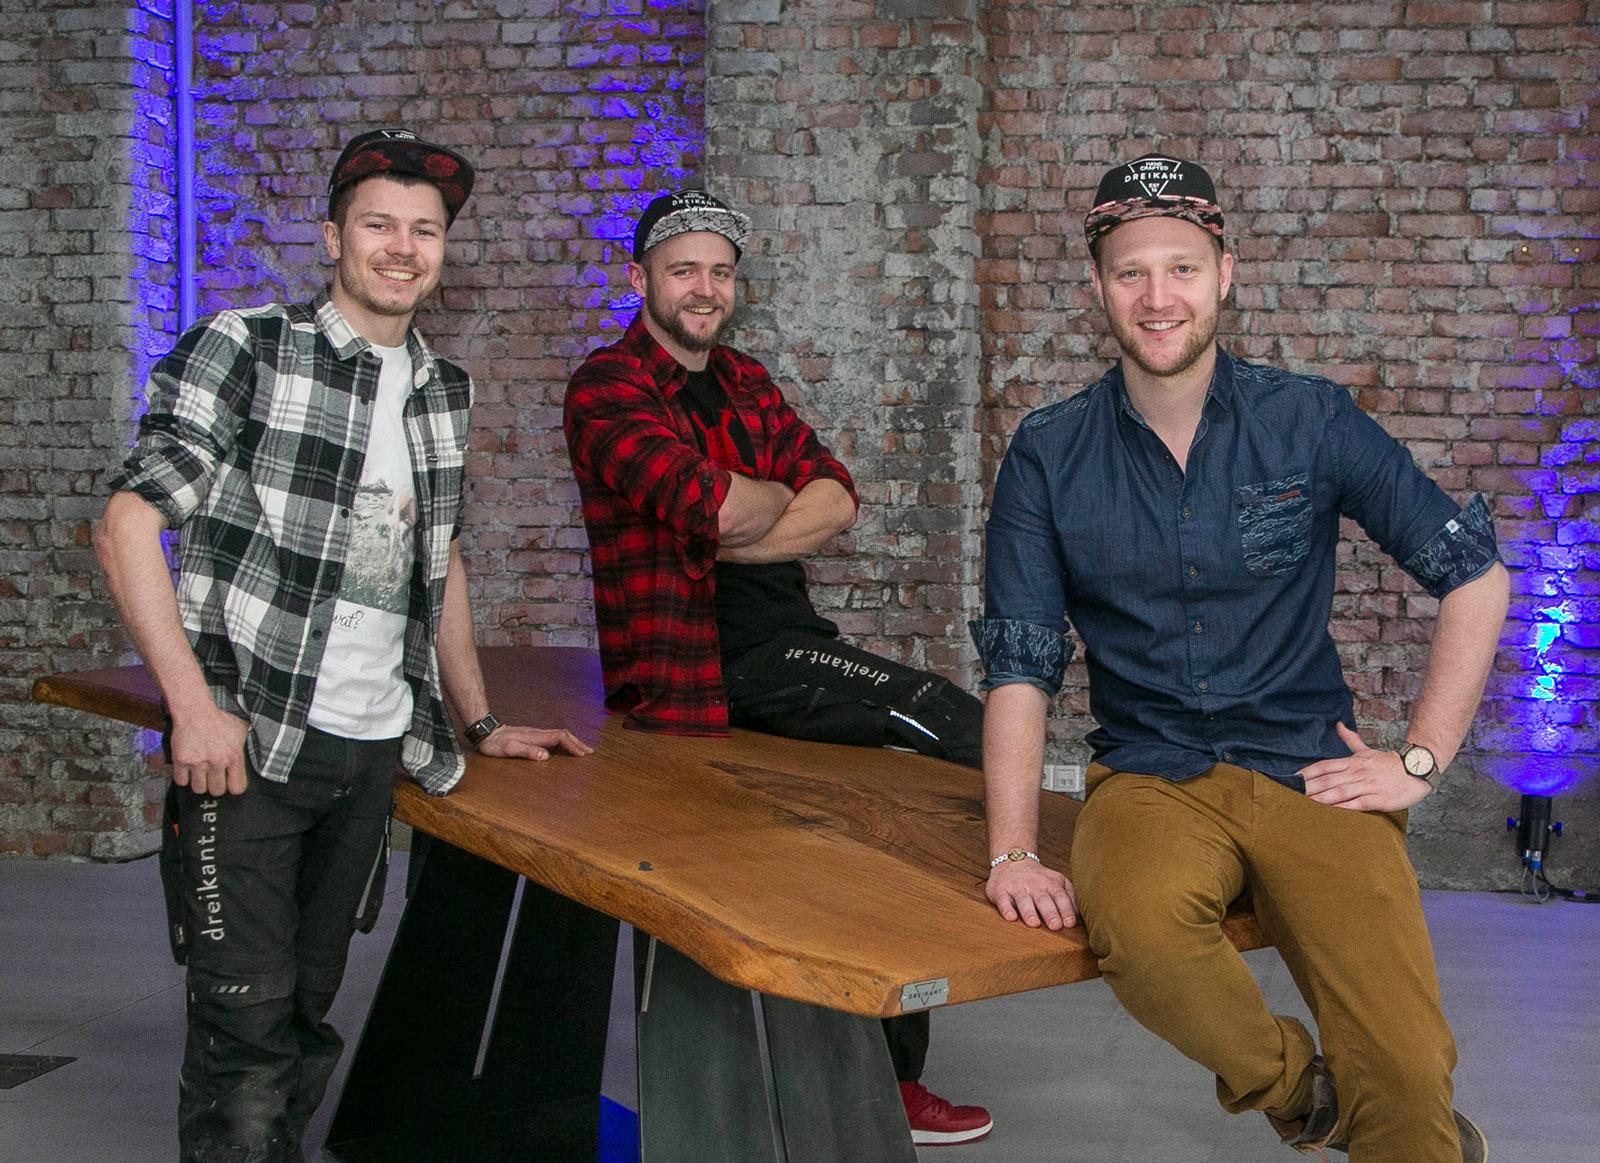 Die Dreikant-Gründer: Stefan Rehrl, Matthais Lienbacher, Mario Siller